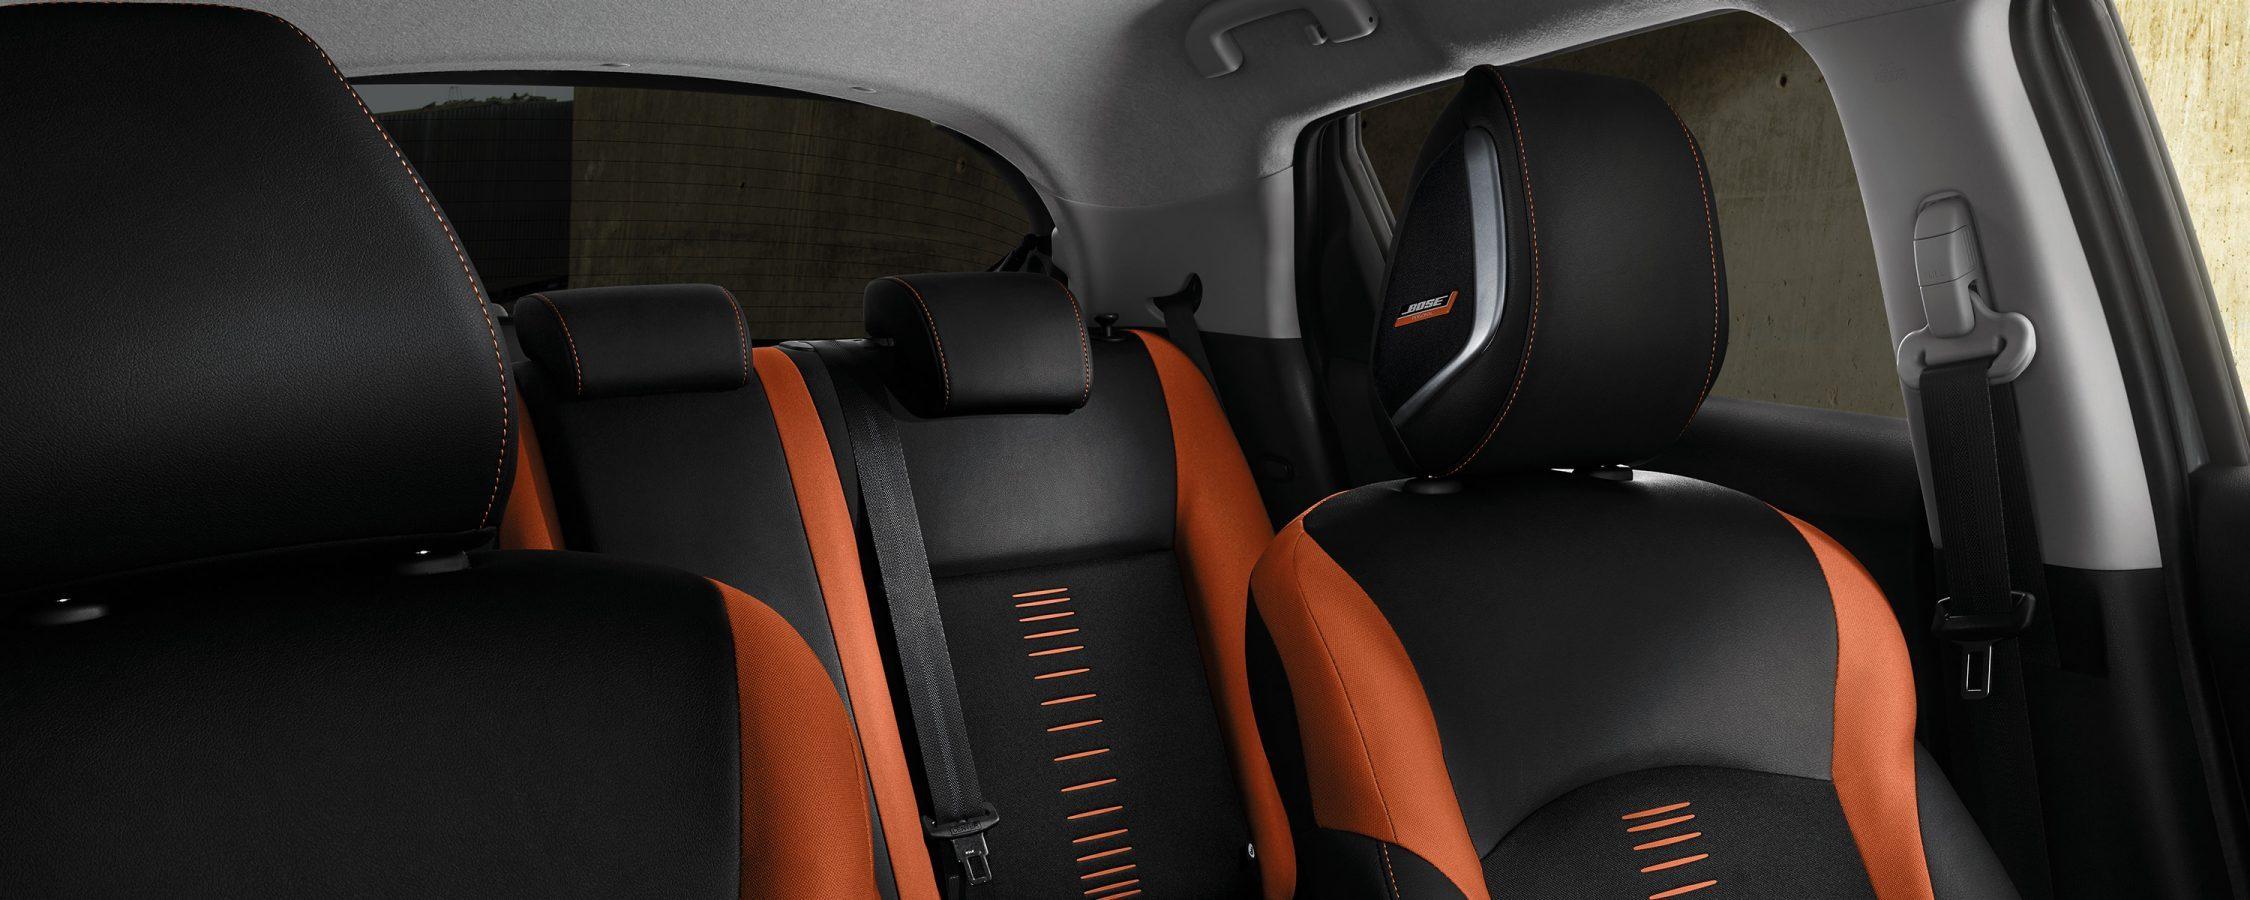 Nissan JUKE2018: салон с оранжевой (Energy Orange) отделкой